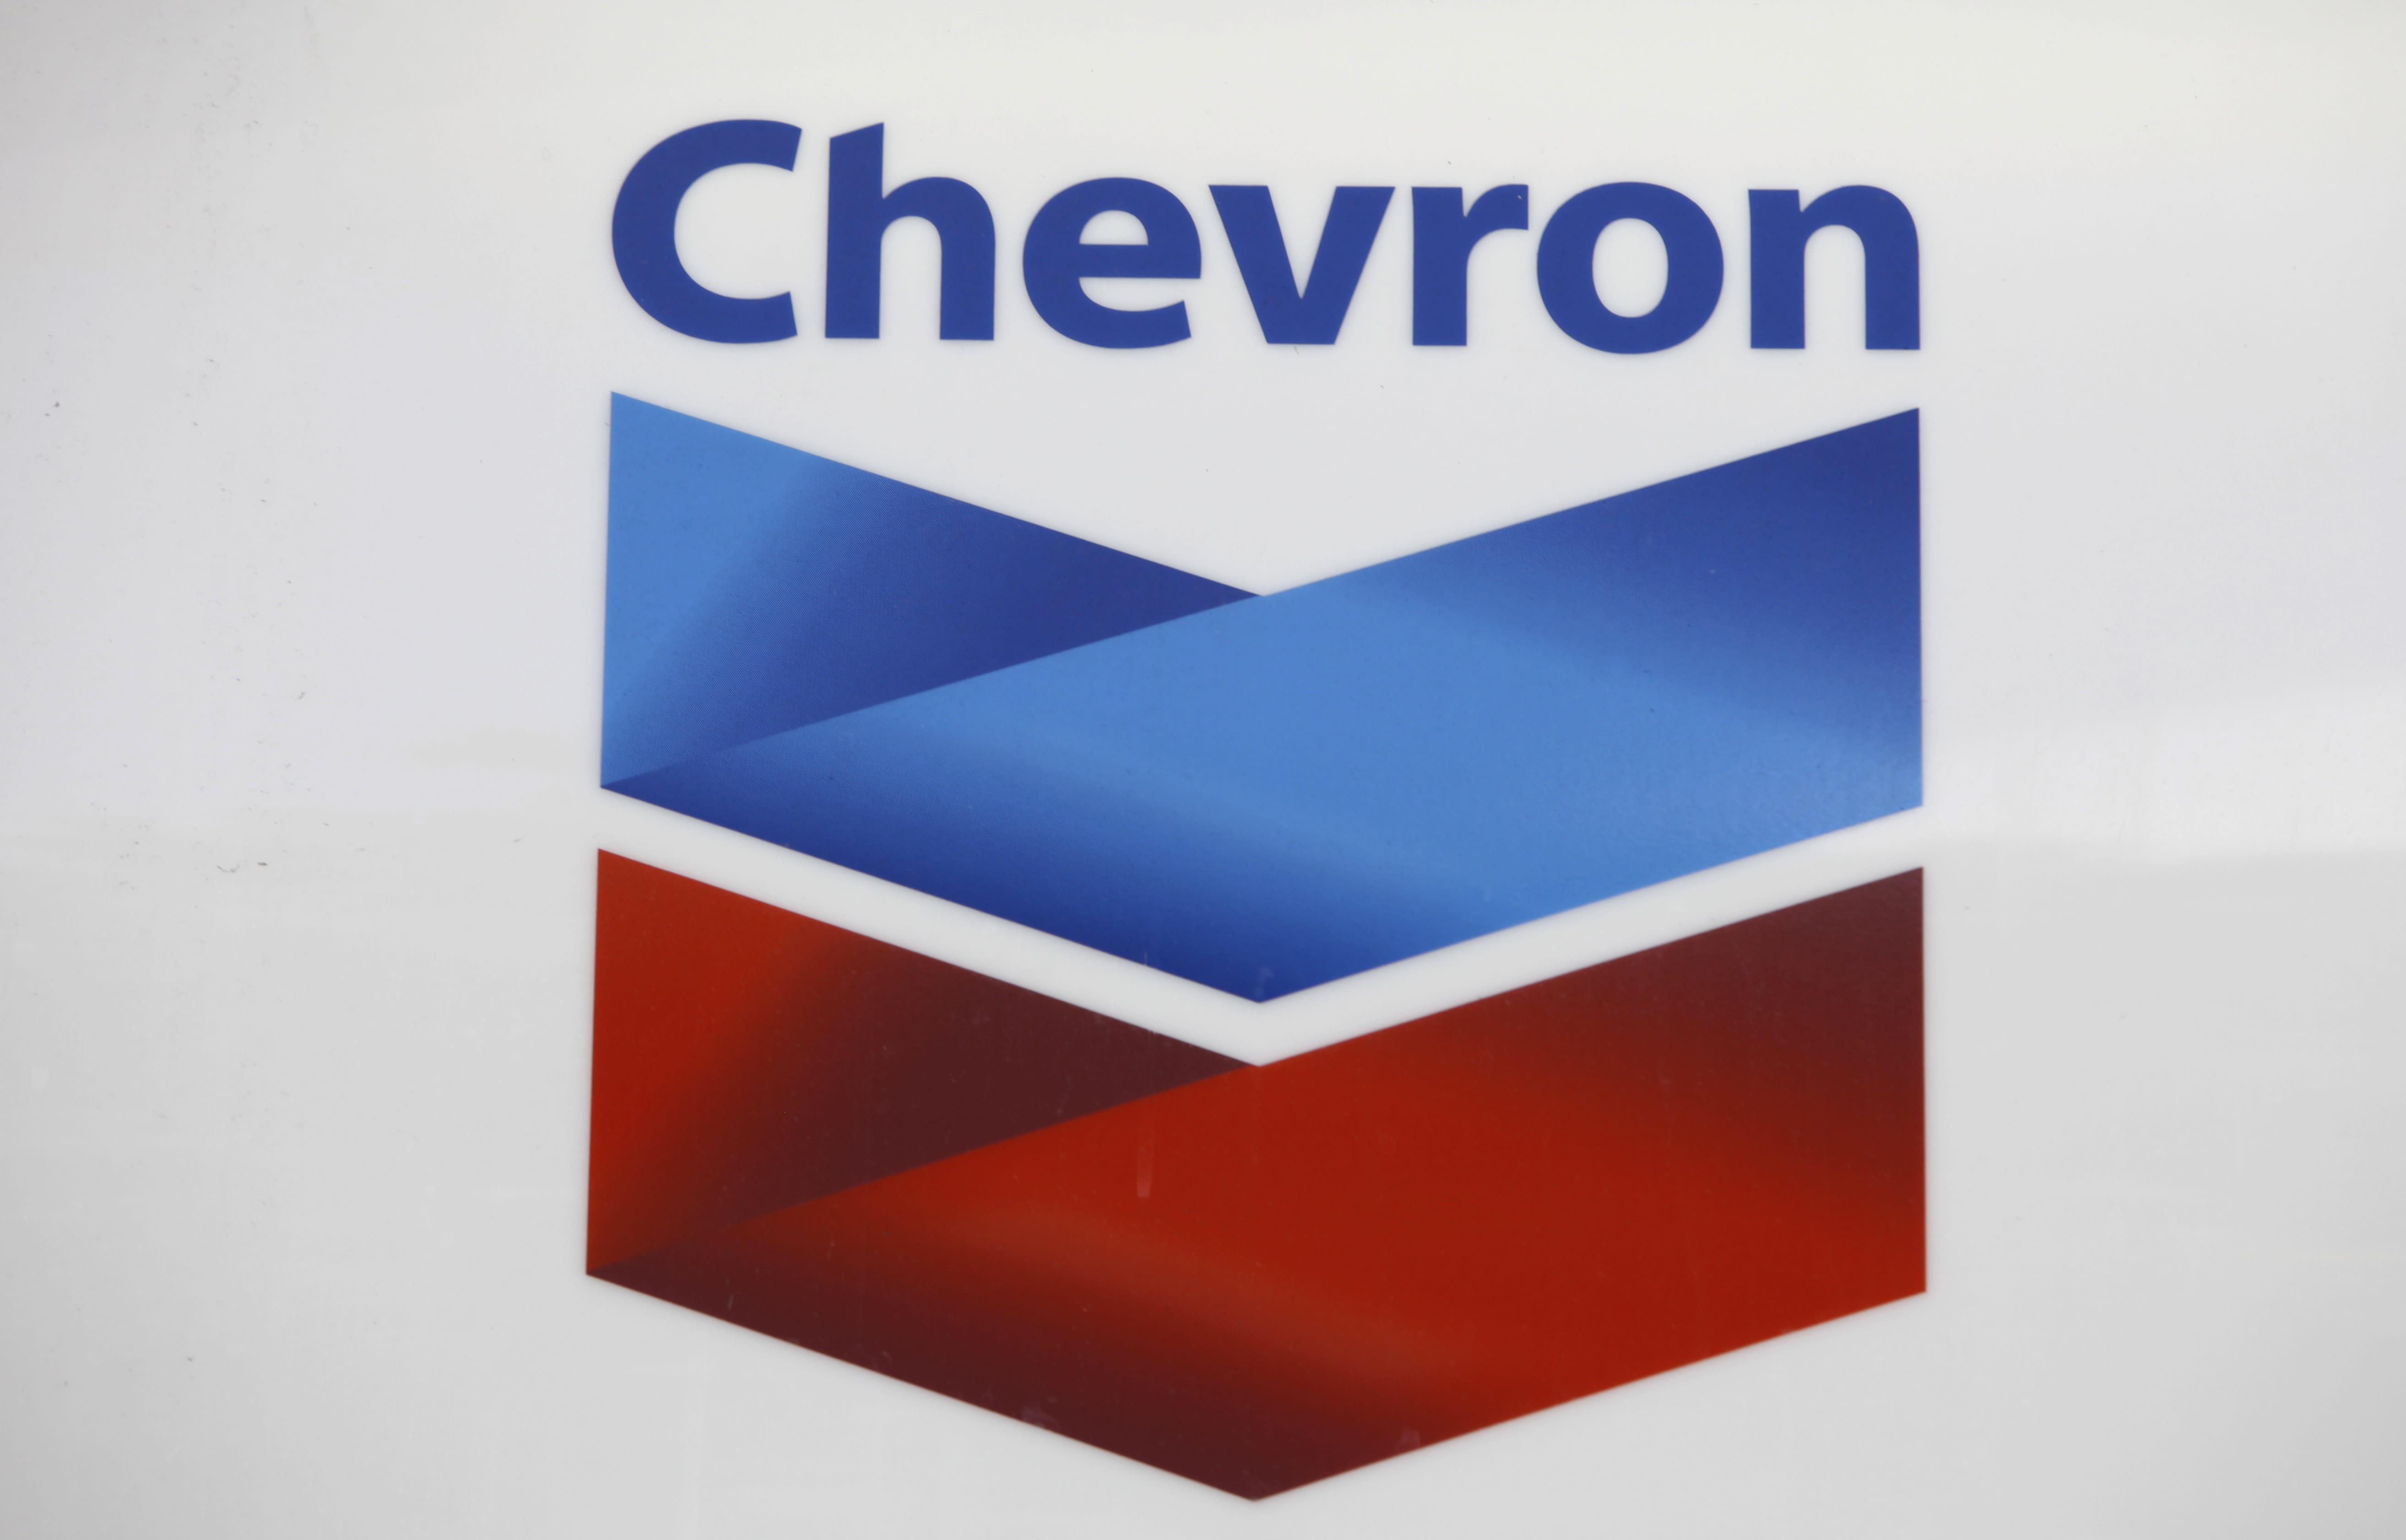 NY judge rules for Chevron in Ecuador case